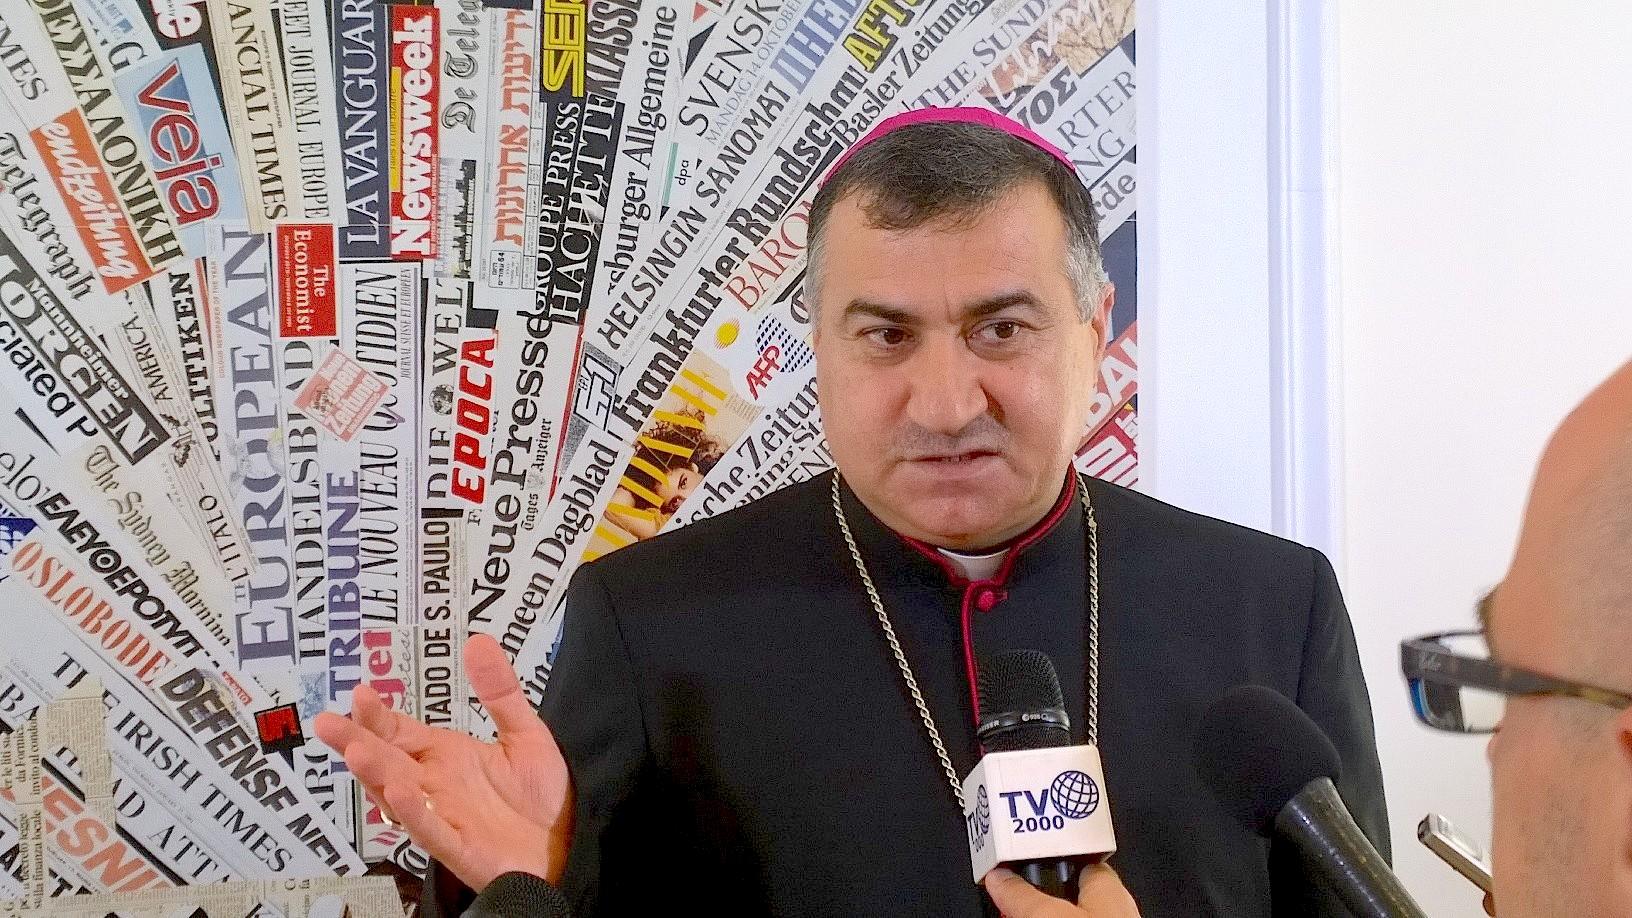 Mons. Warda archbishop of Erbil in the Kurdistan in Irak